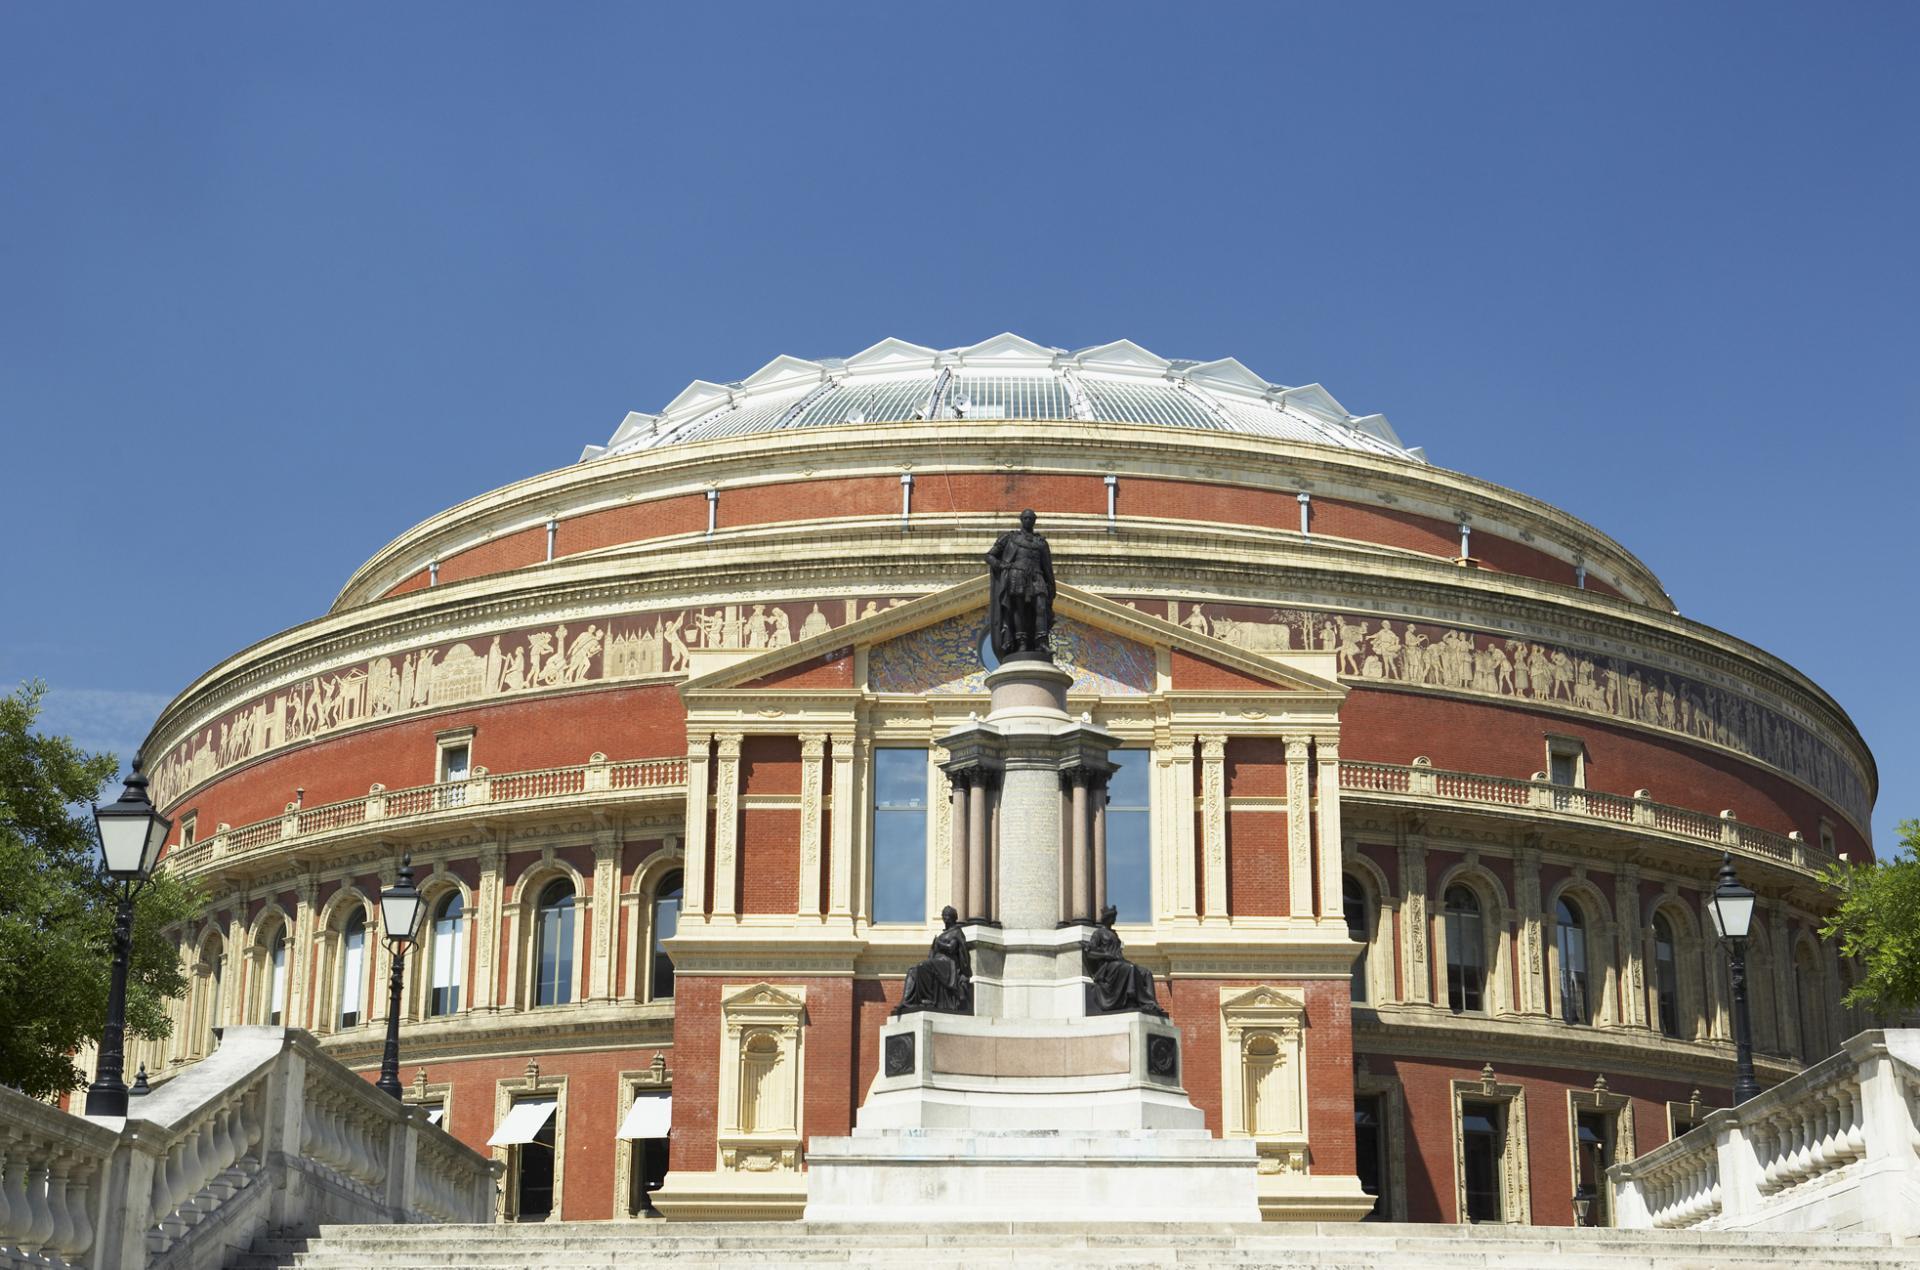 Royal Albert Hall en Kensington Gardens